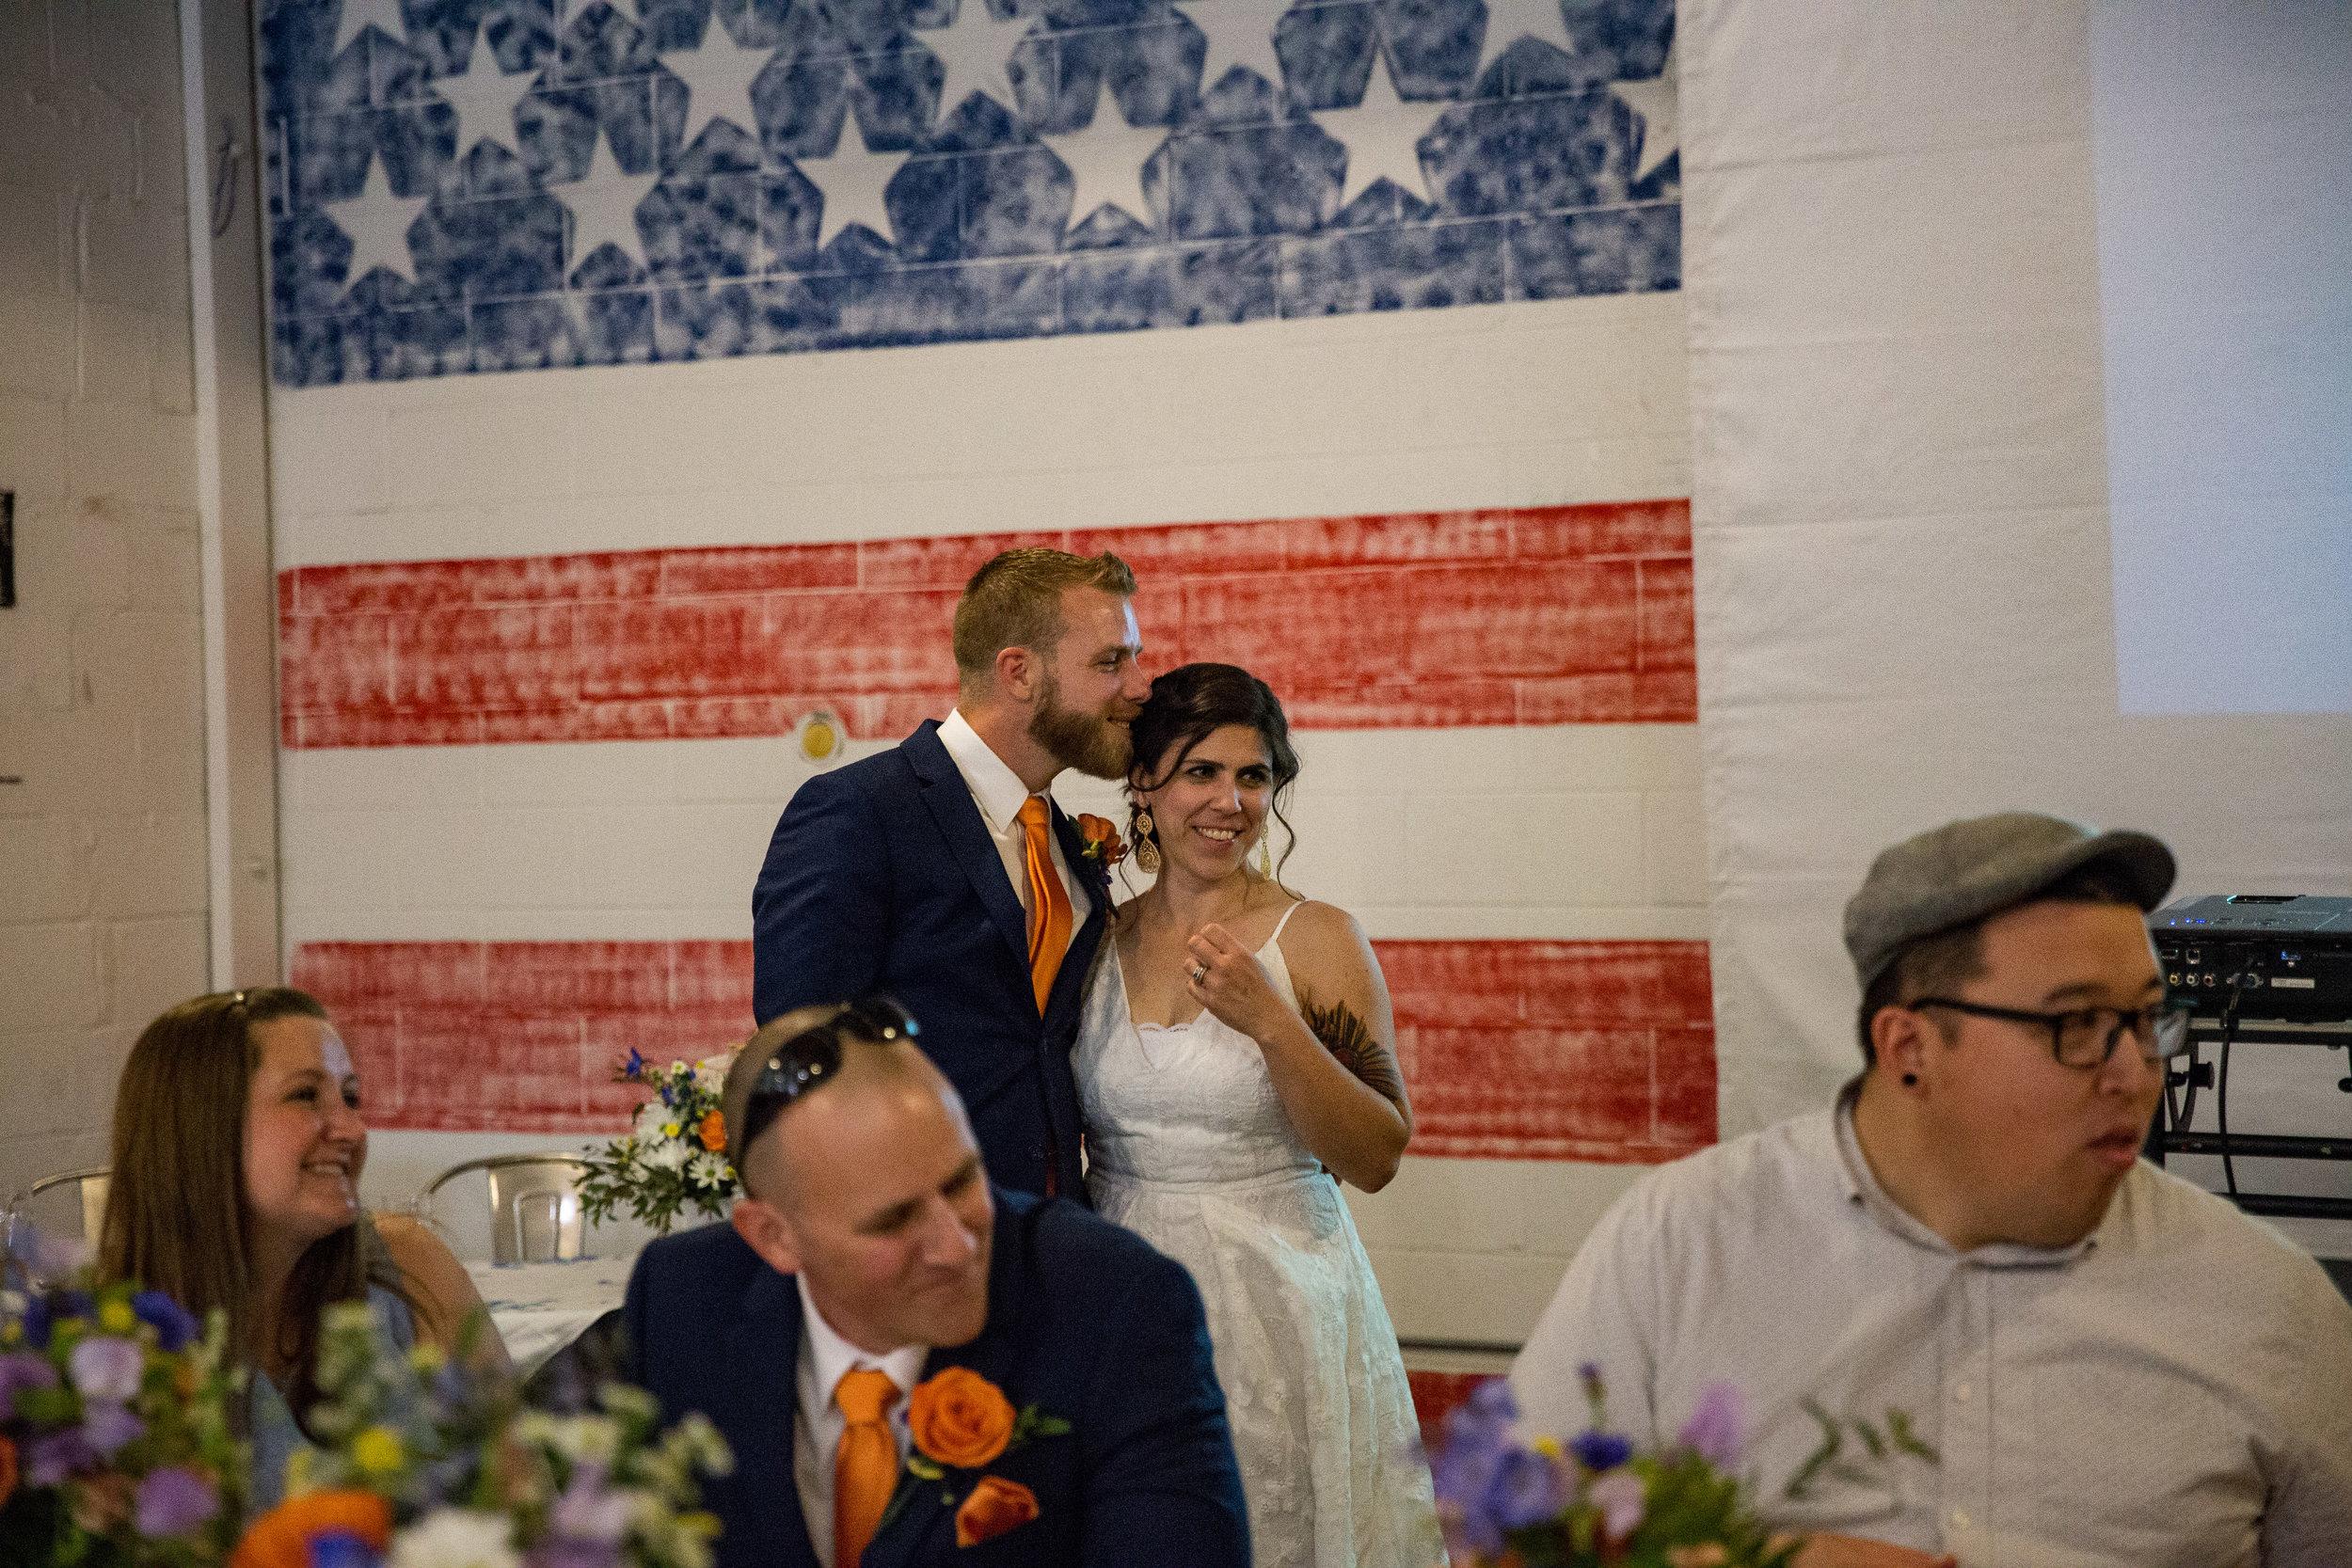 Natalie and Dallas Mooney Wedding 6-8-19_Tania Watt Photography-520.jpg